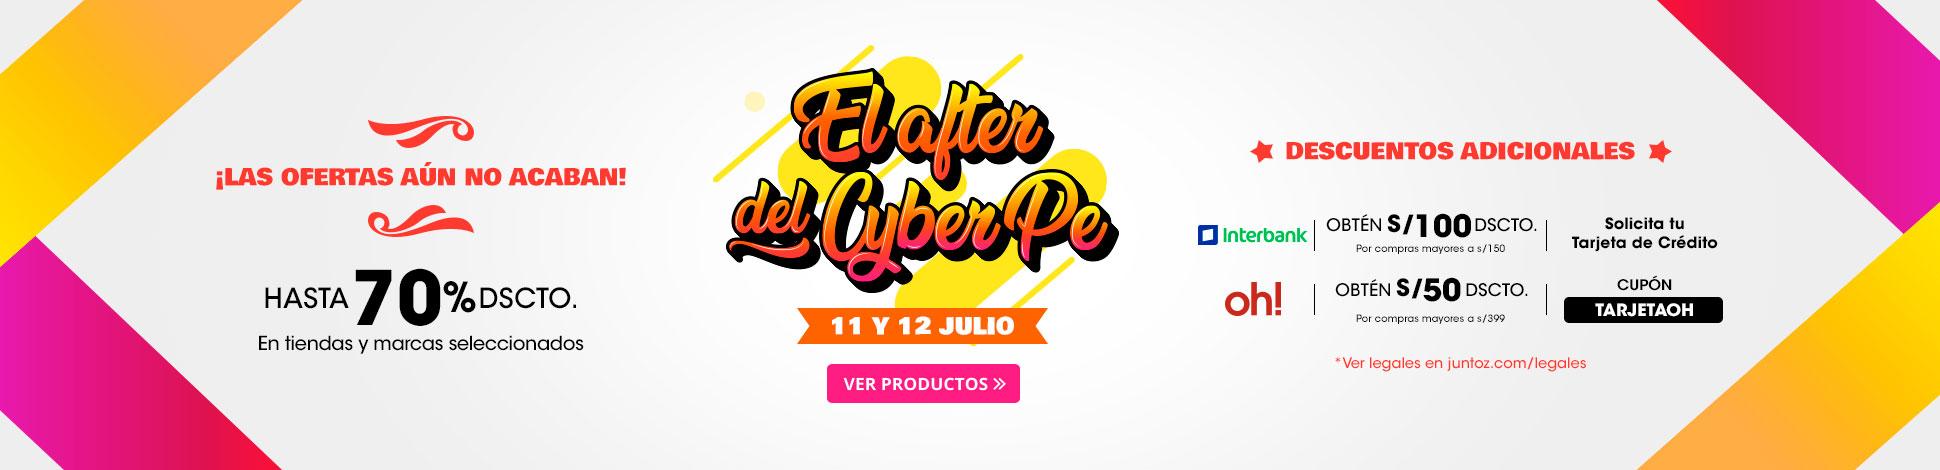 hs-after-cyber-pe.jpg | Juntoz.com